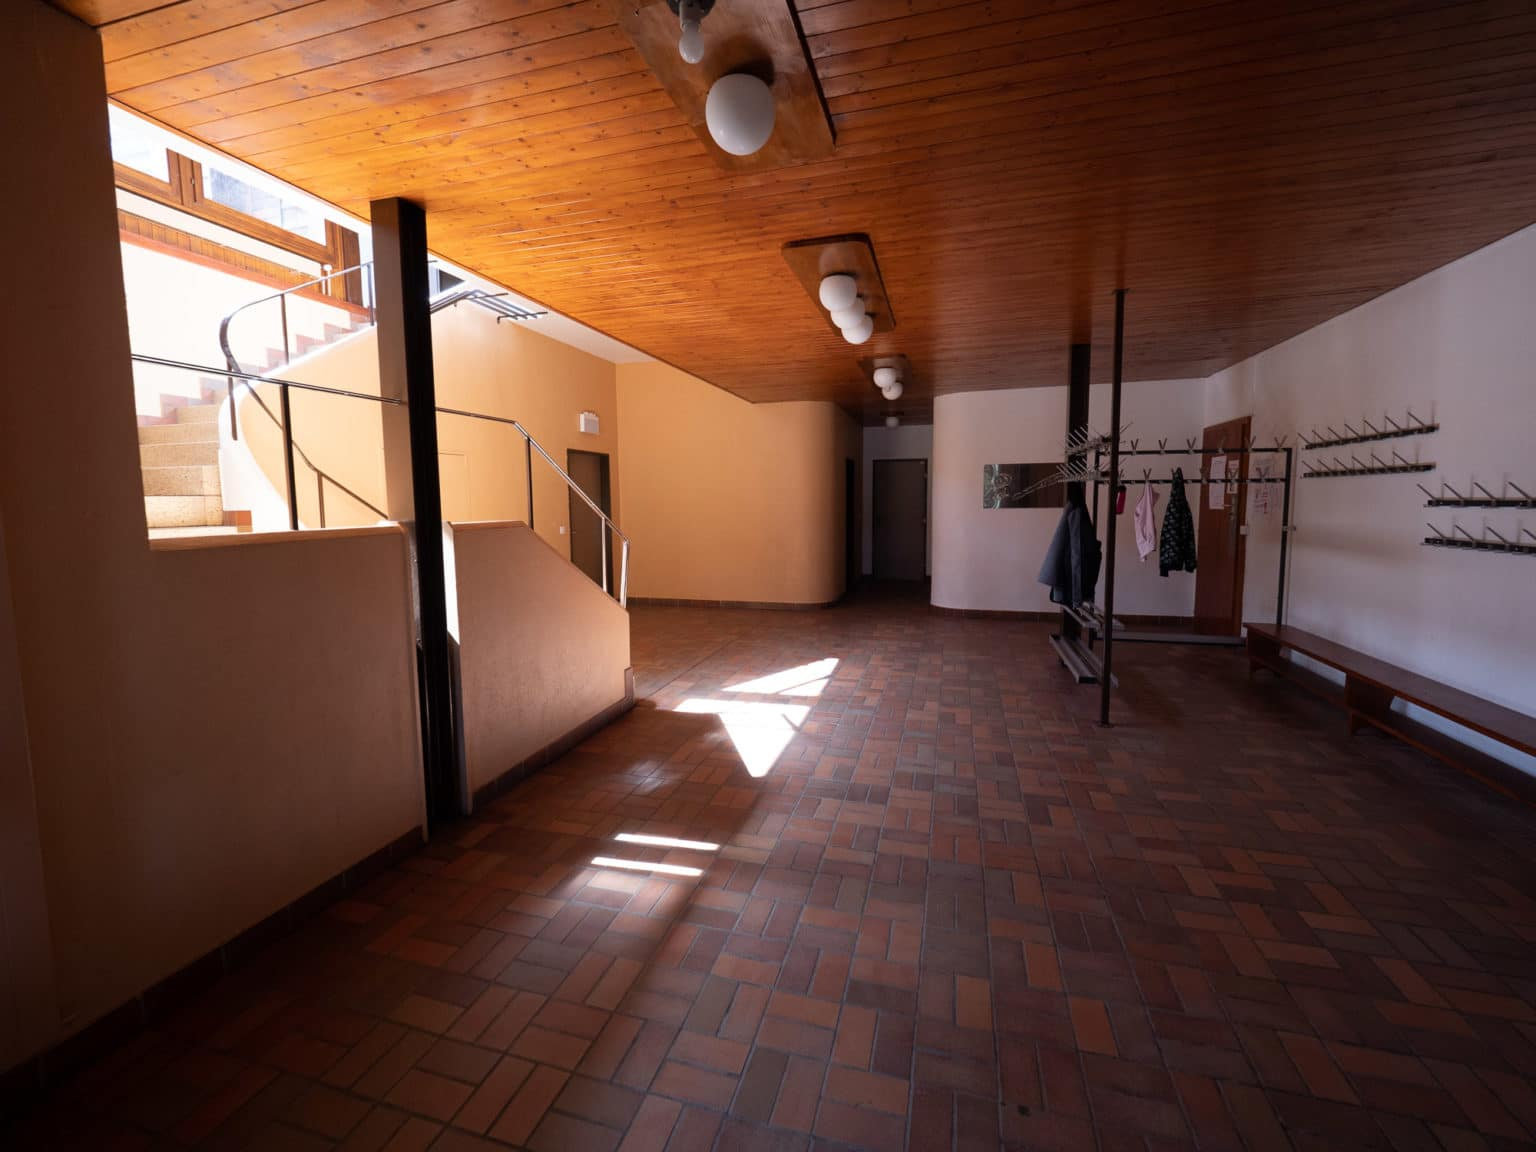 Refuges-salles-Montanaire©V-Dubach-52578